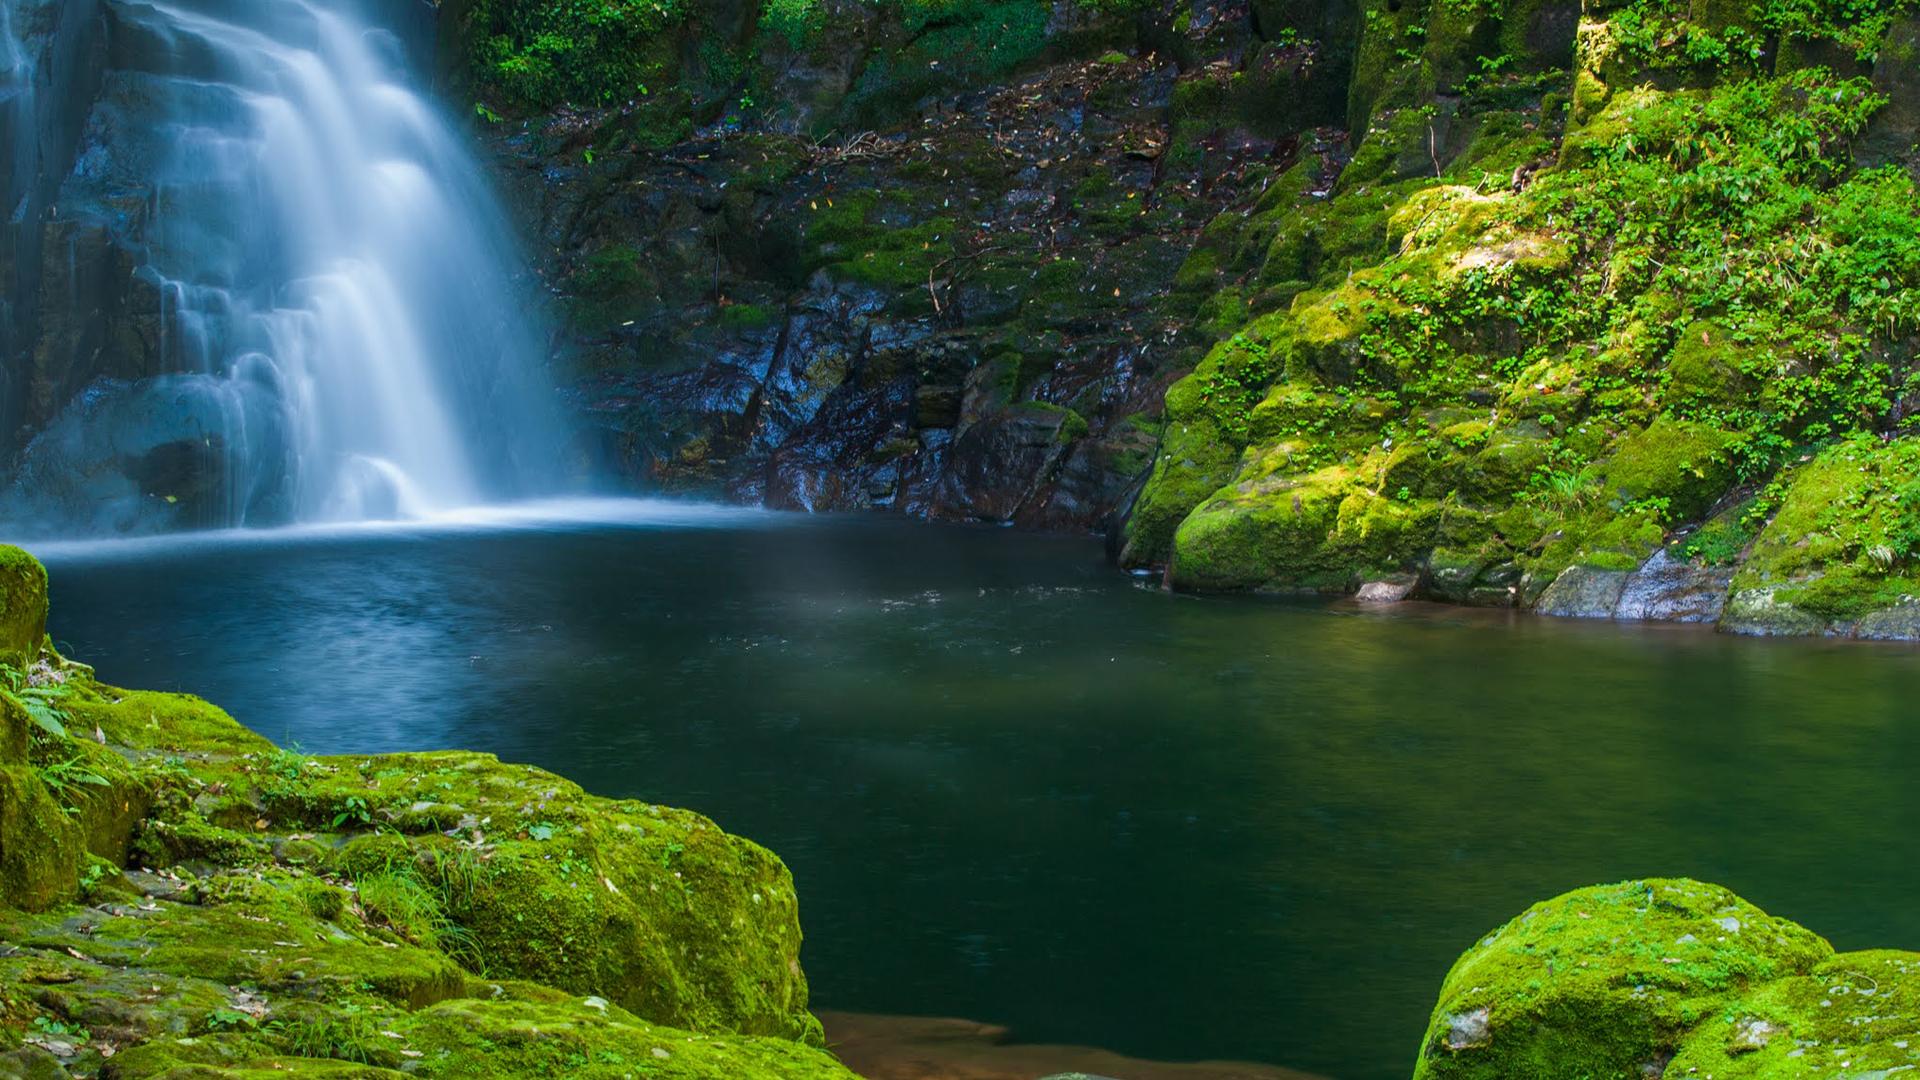 Falls Wallpaper Waterfall Nature Images Hd Akame Shijuhachi Waterfall Japan Hd